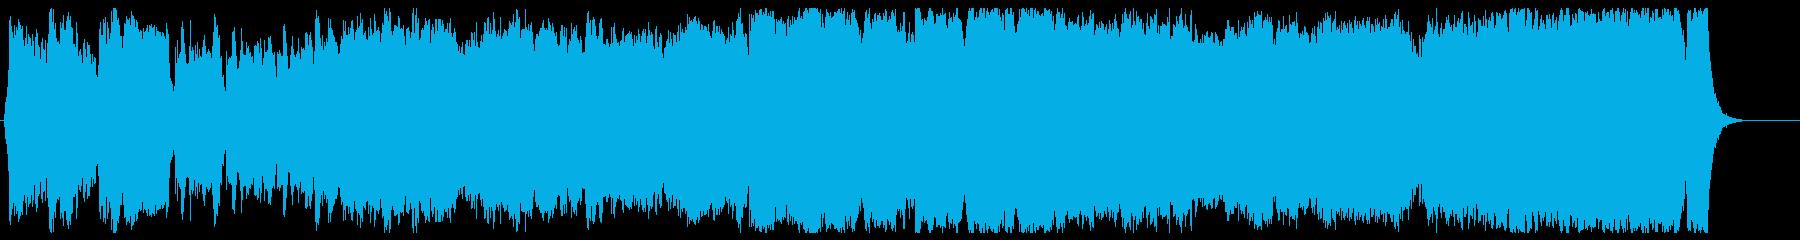 JURASSIC ADVENTUREの再生済みの波形